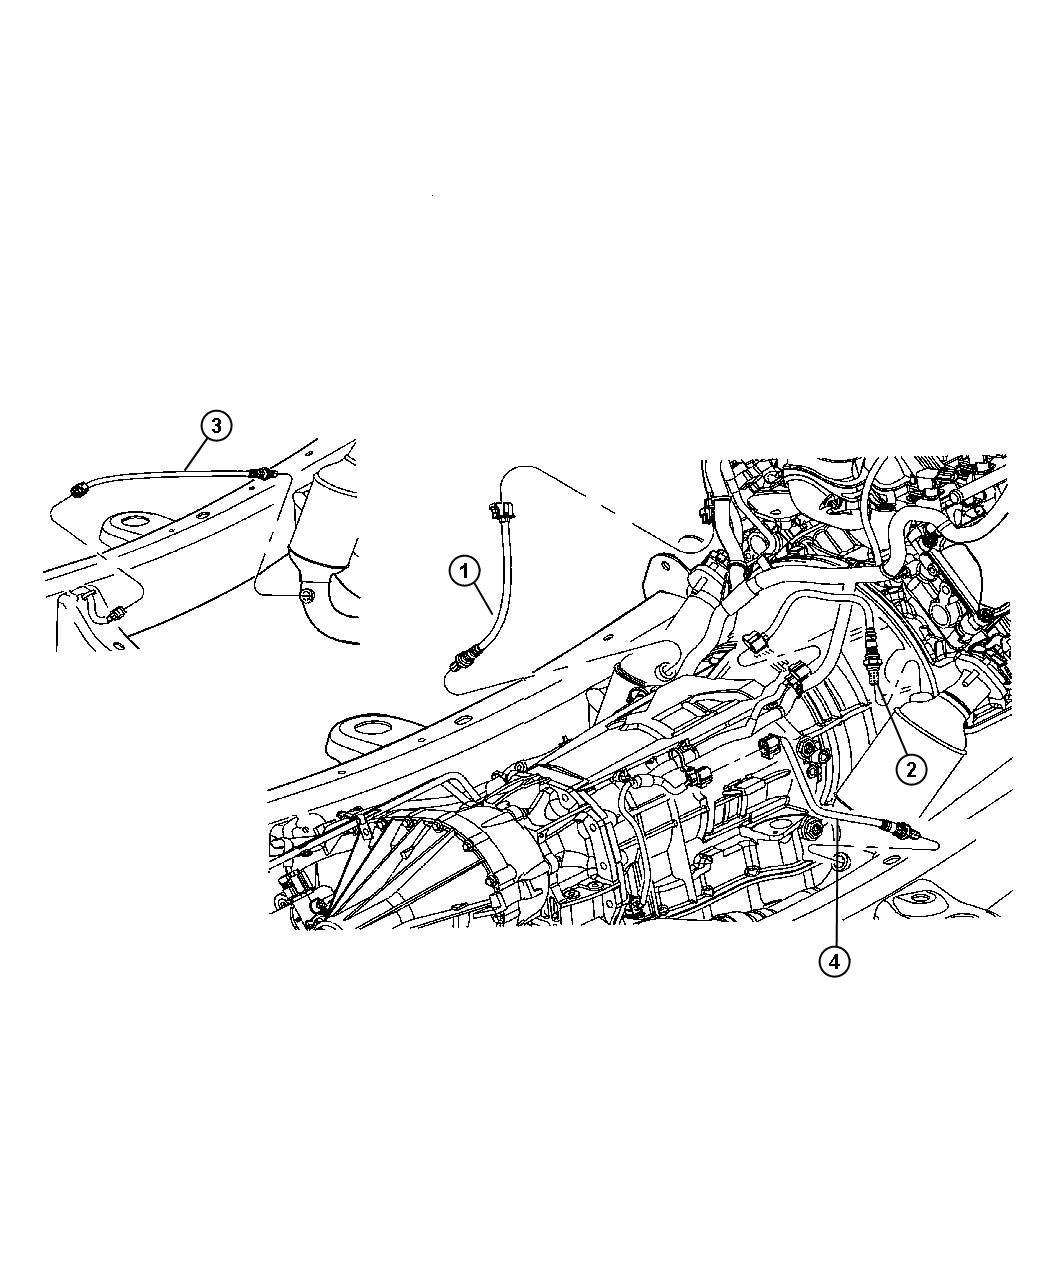 3 1 V6 Engine Diagram Sensors